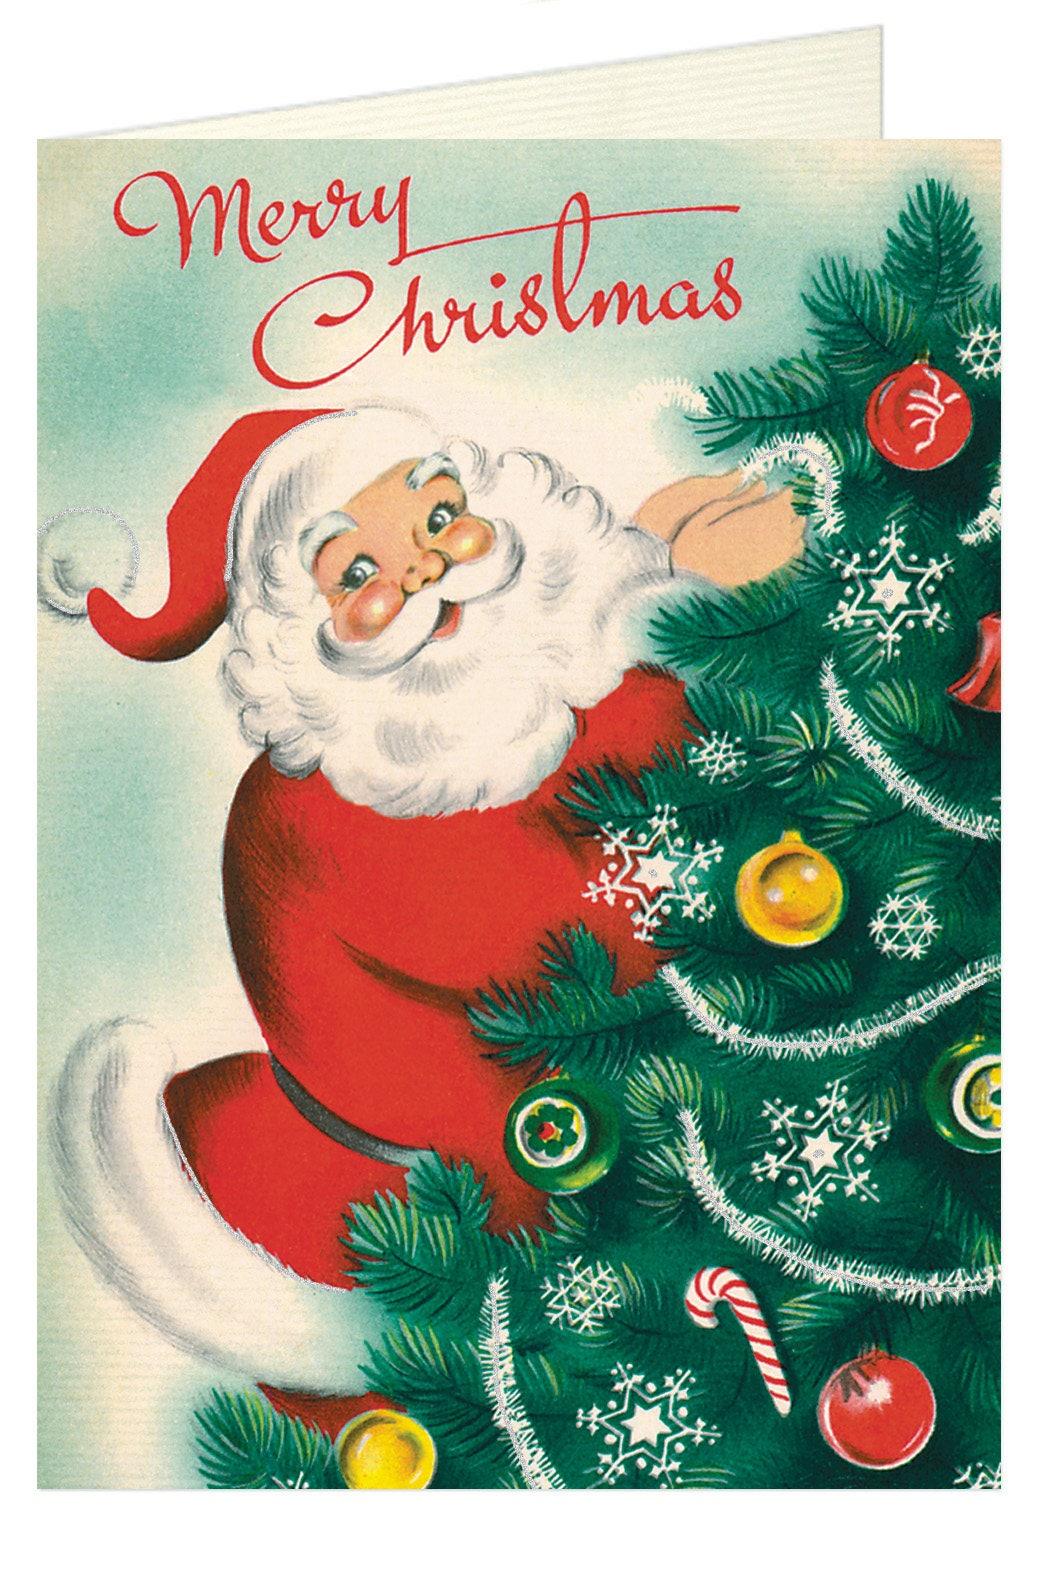 Vintage Christmas Santa Card Christmas Card Old Fashioned | Etsy